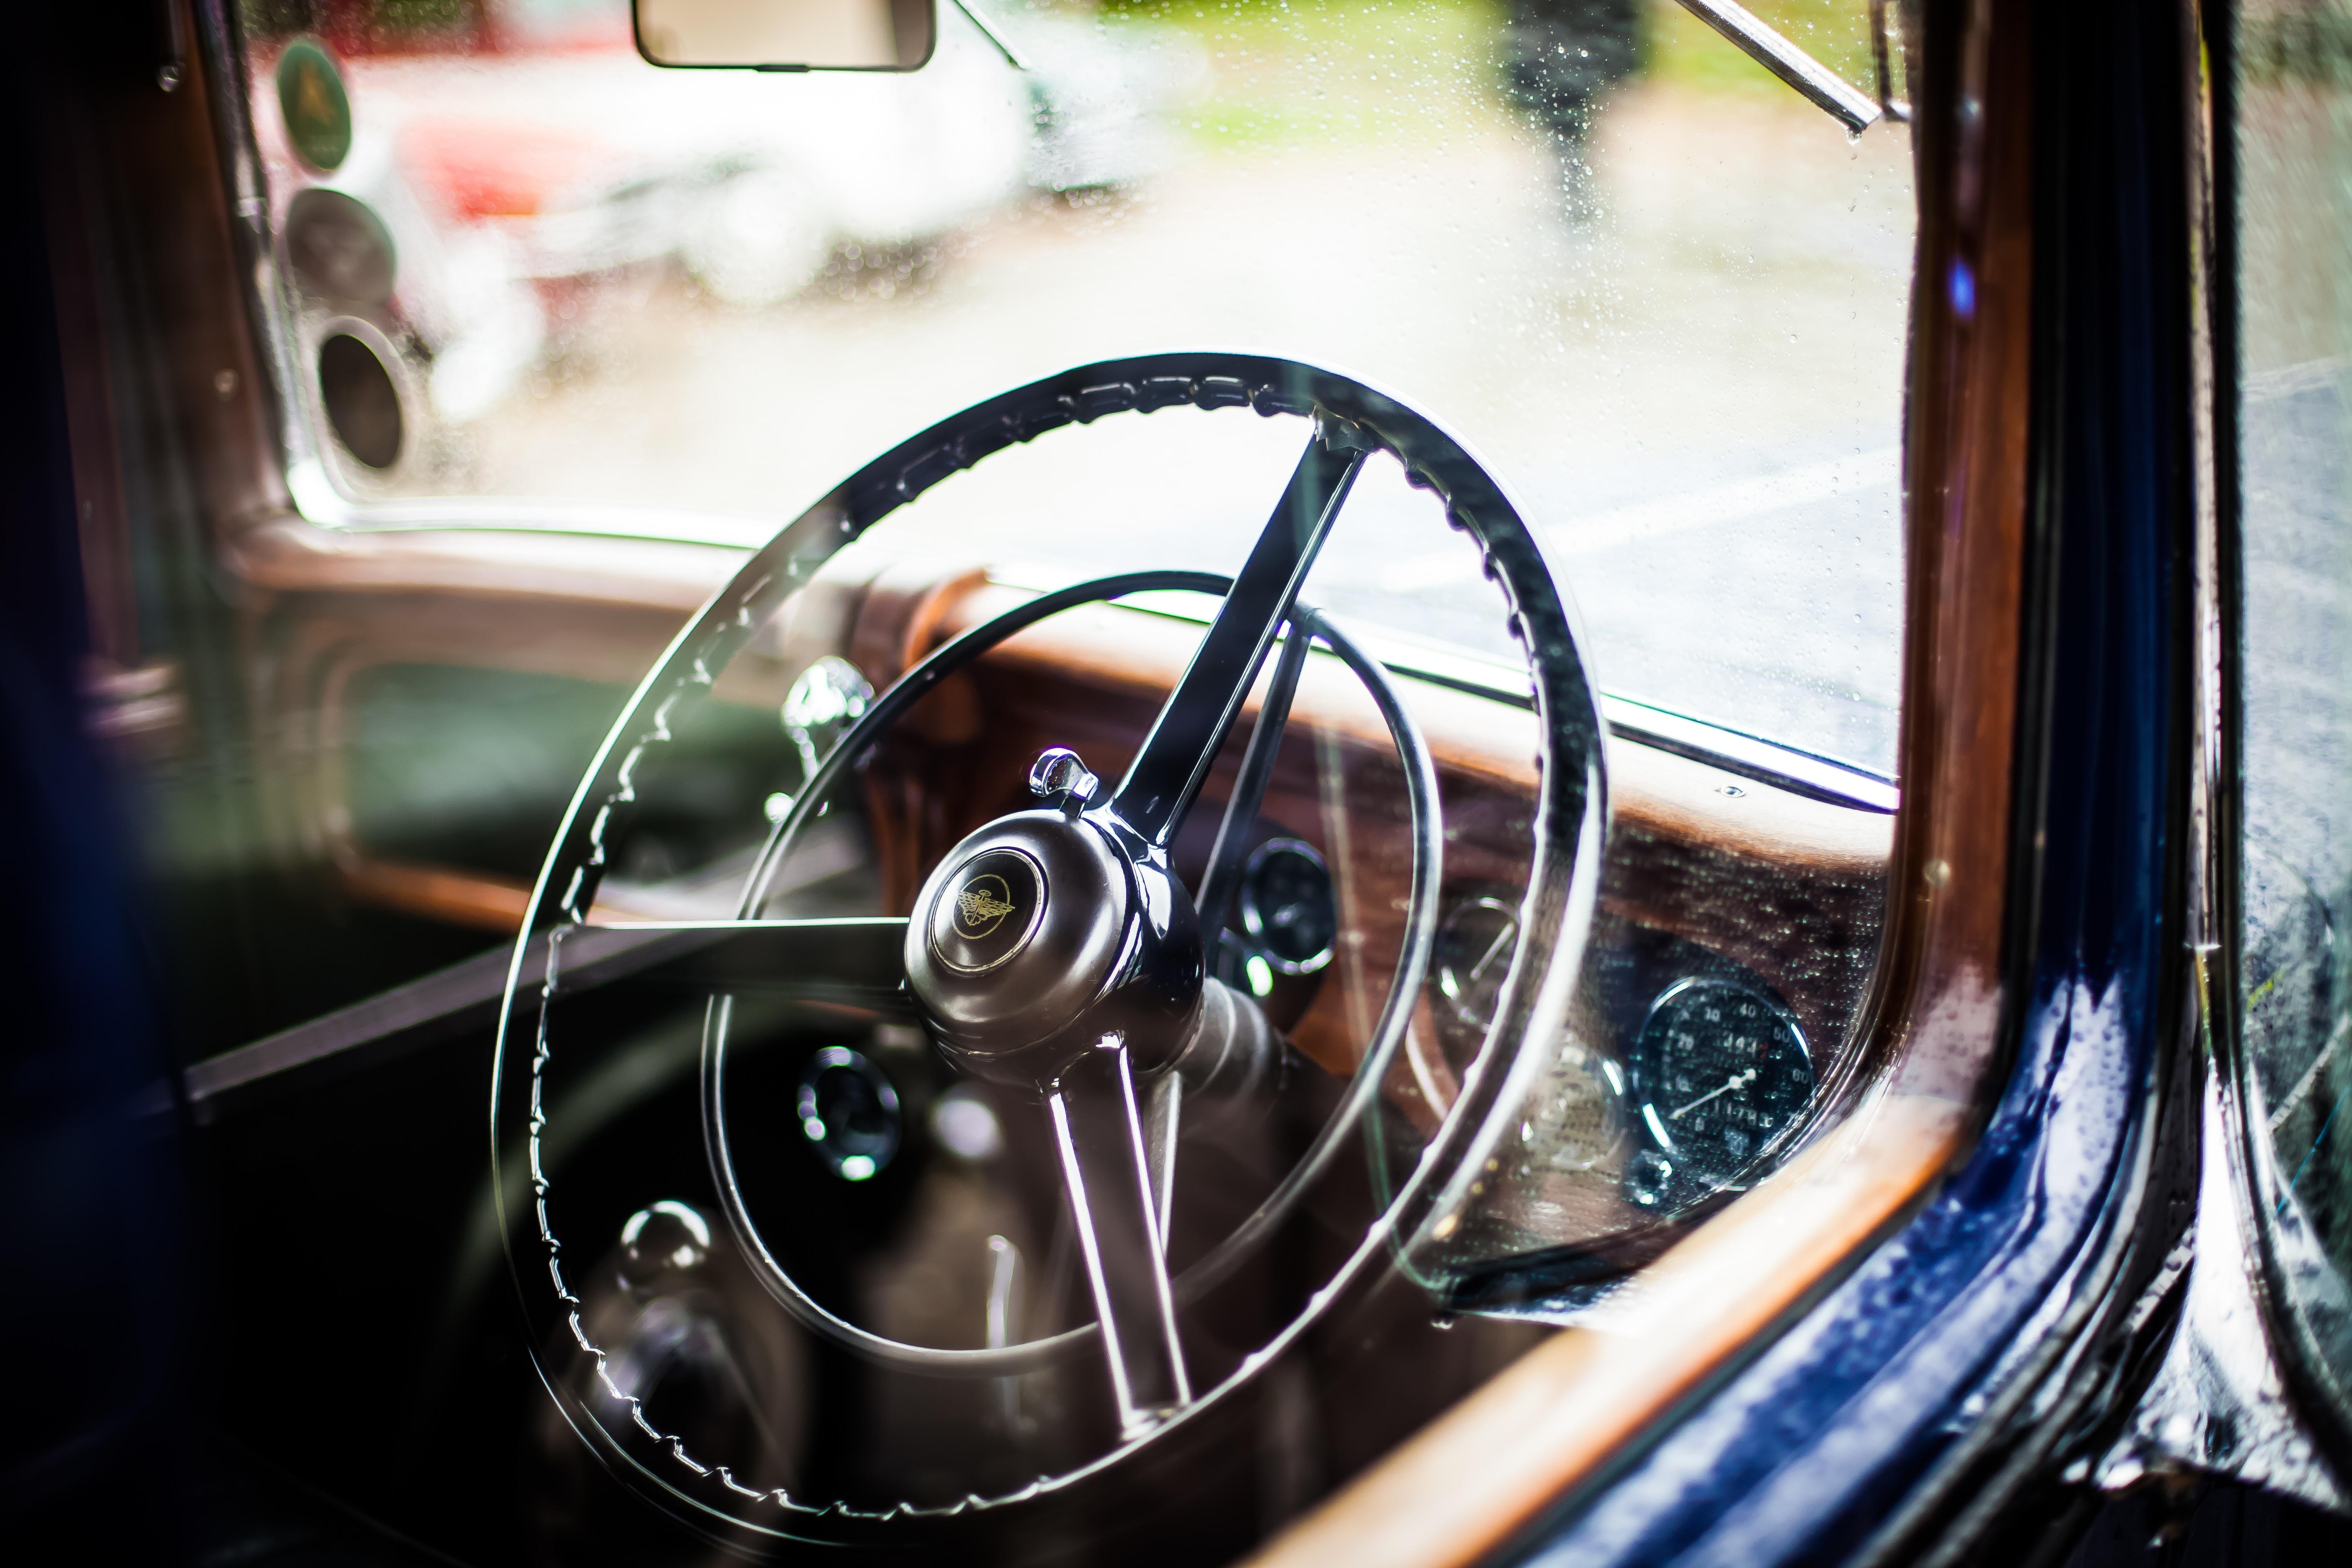 Vintage chrome steering wheel and dashboard seen through car window